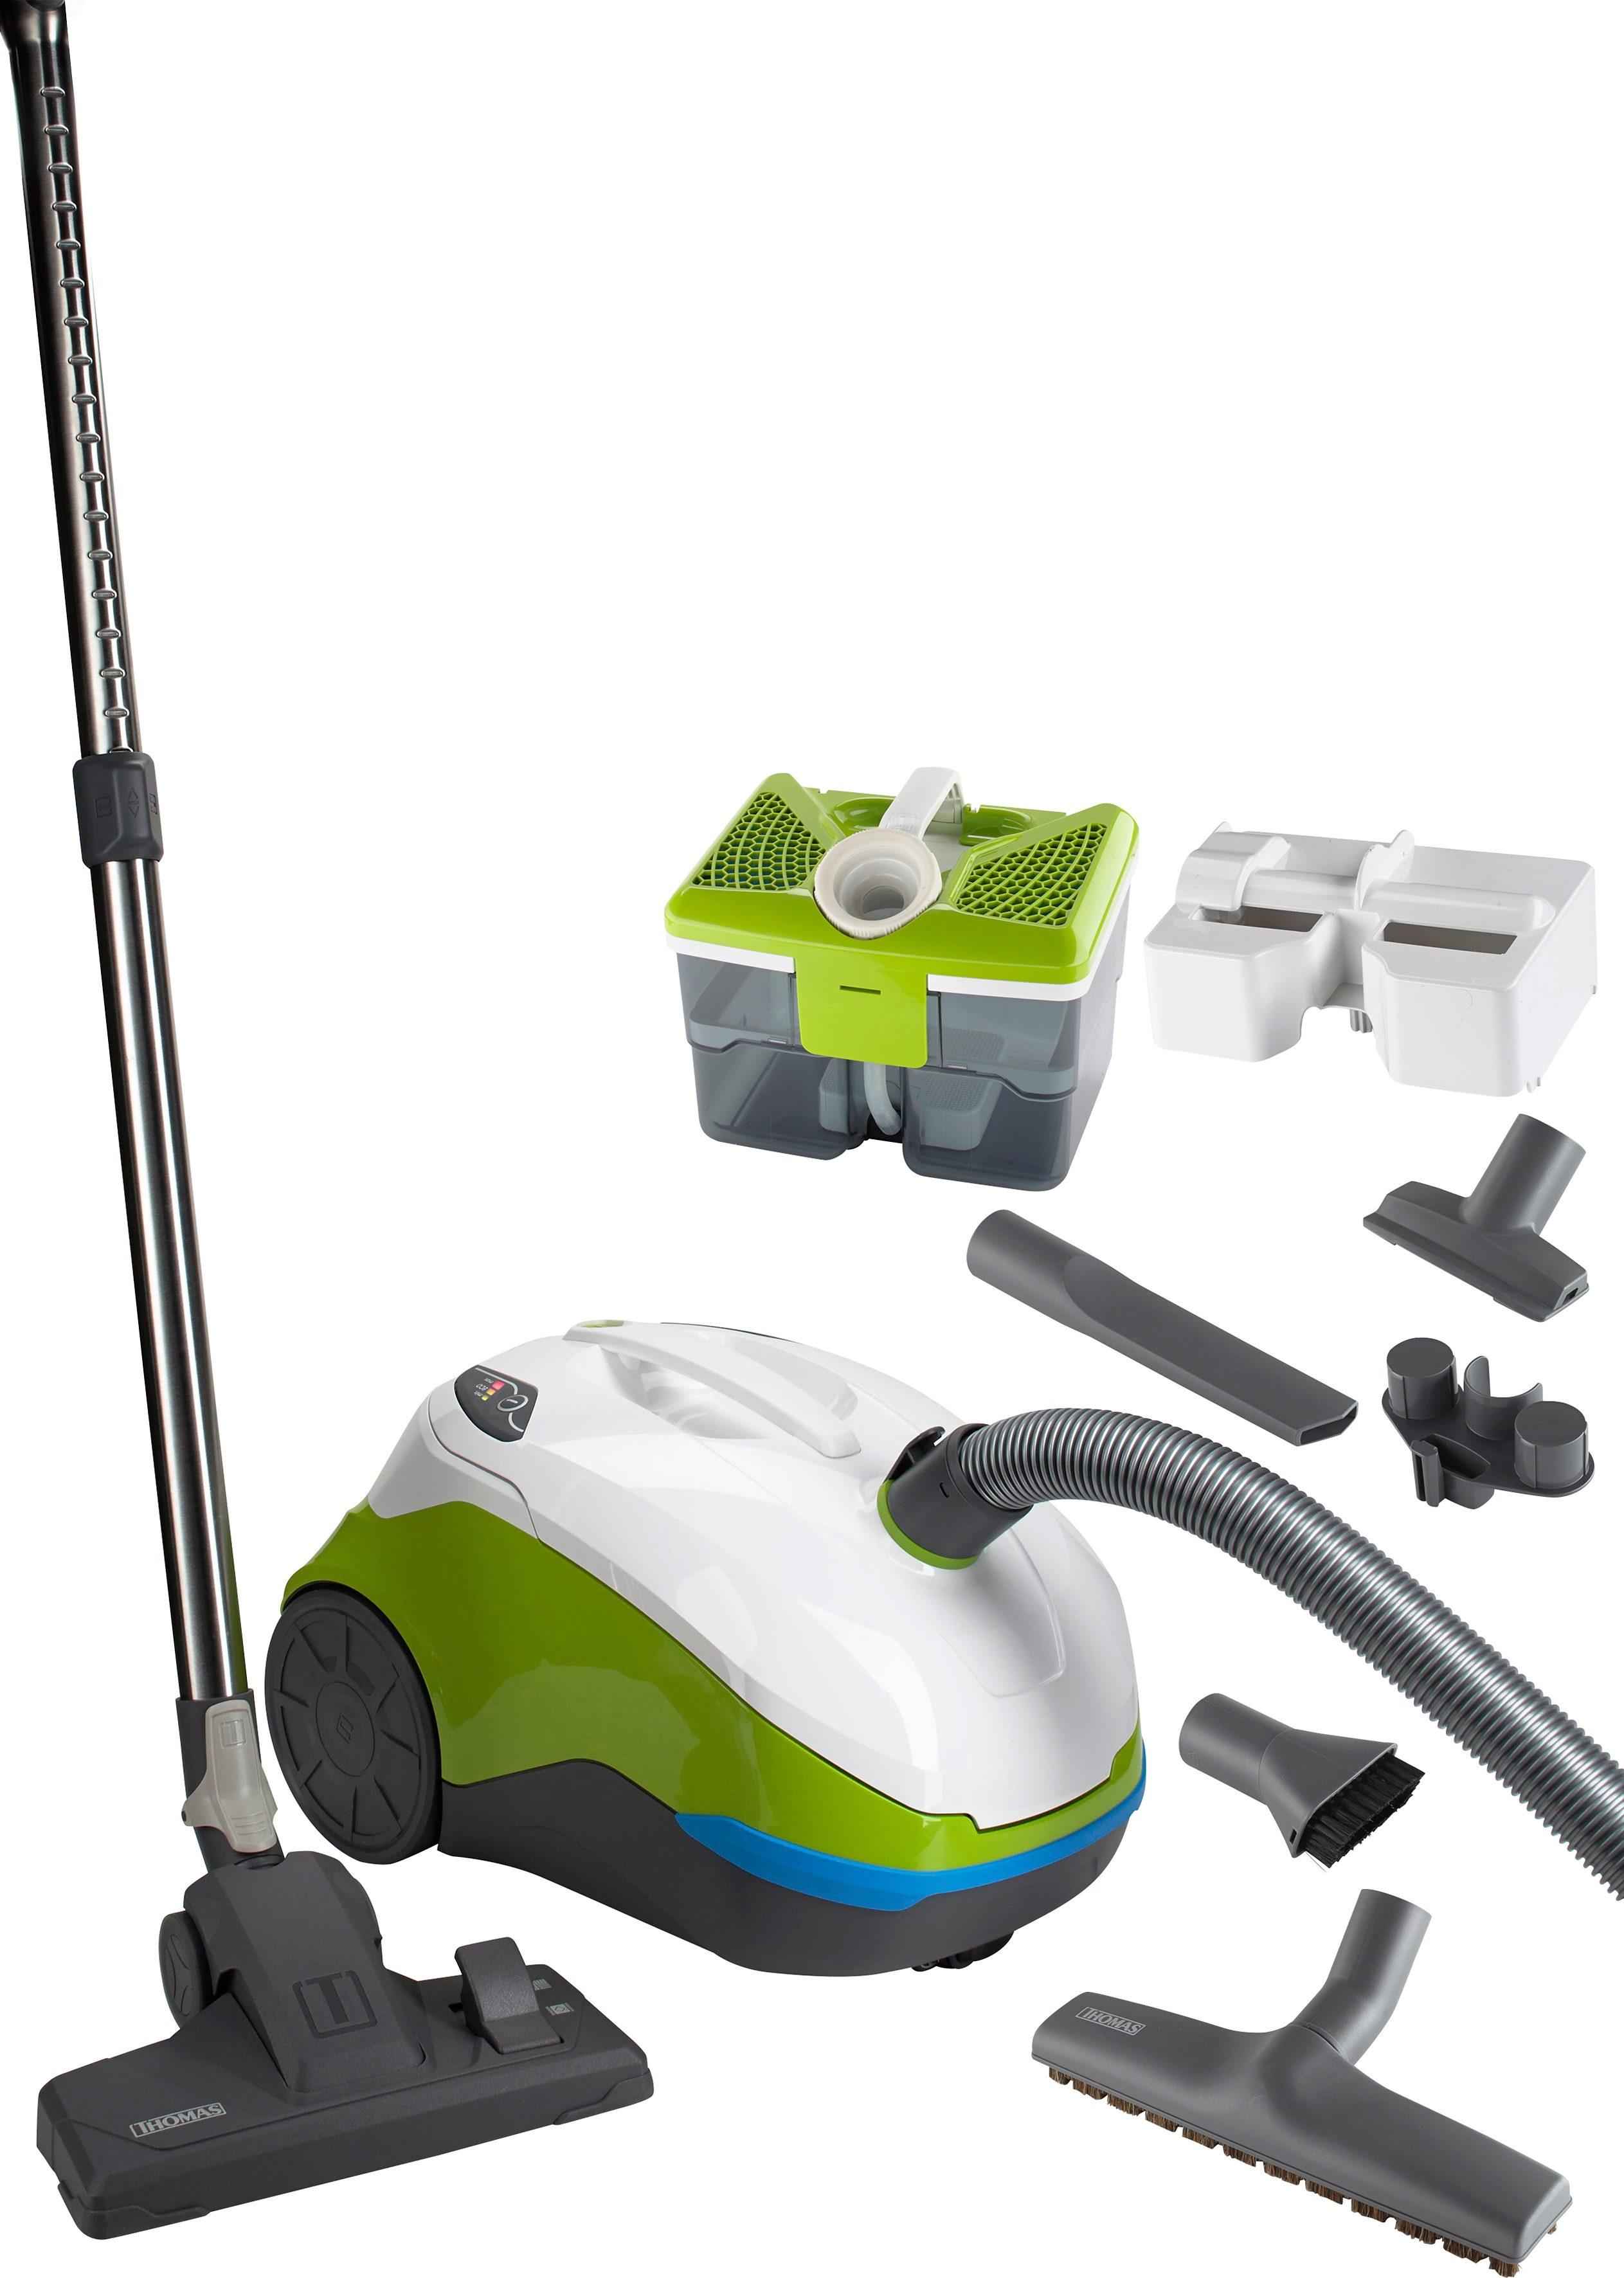 Thomas Staubsauger mit Wasserfilter perfect air feel fresh x3, grün/blau